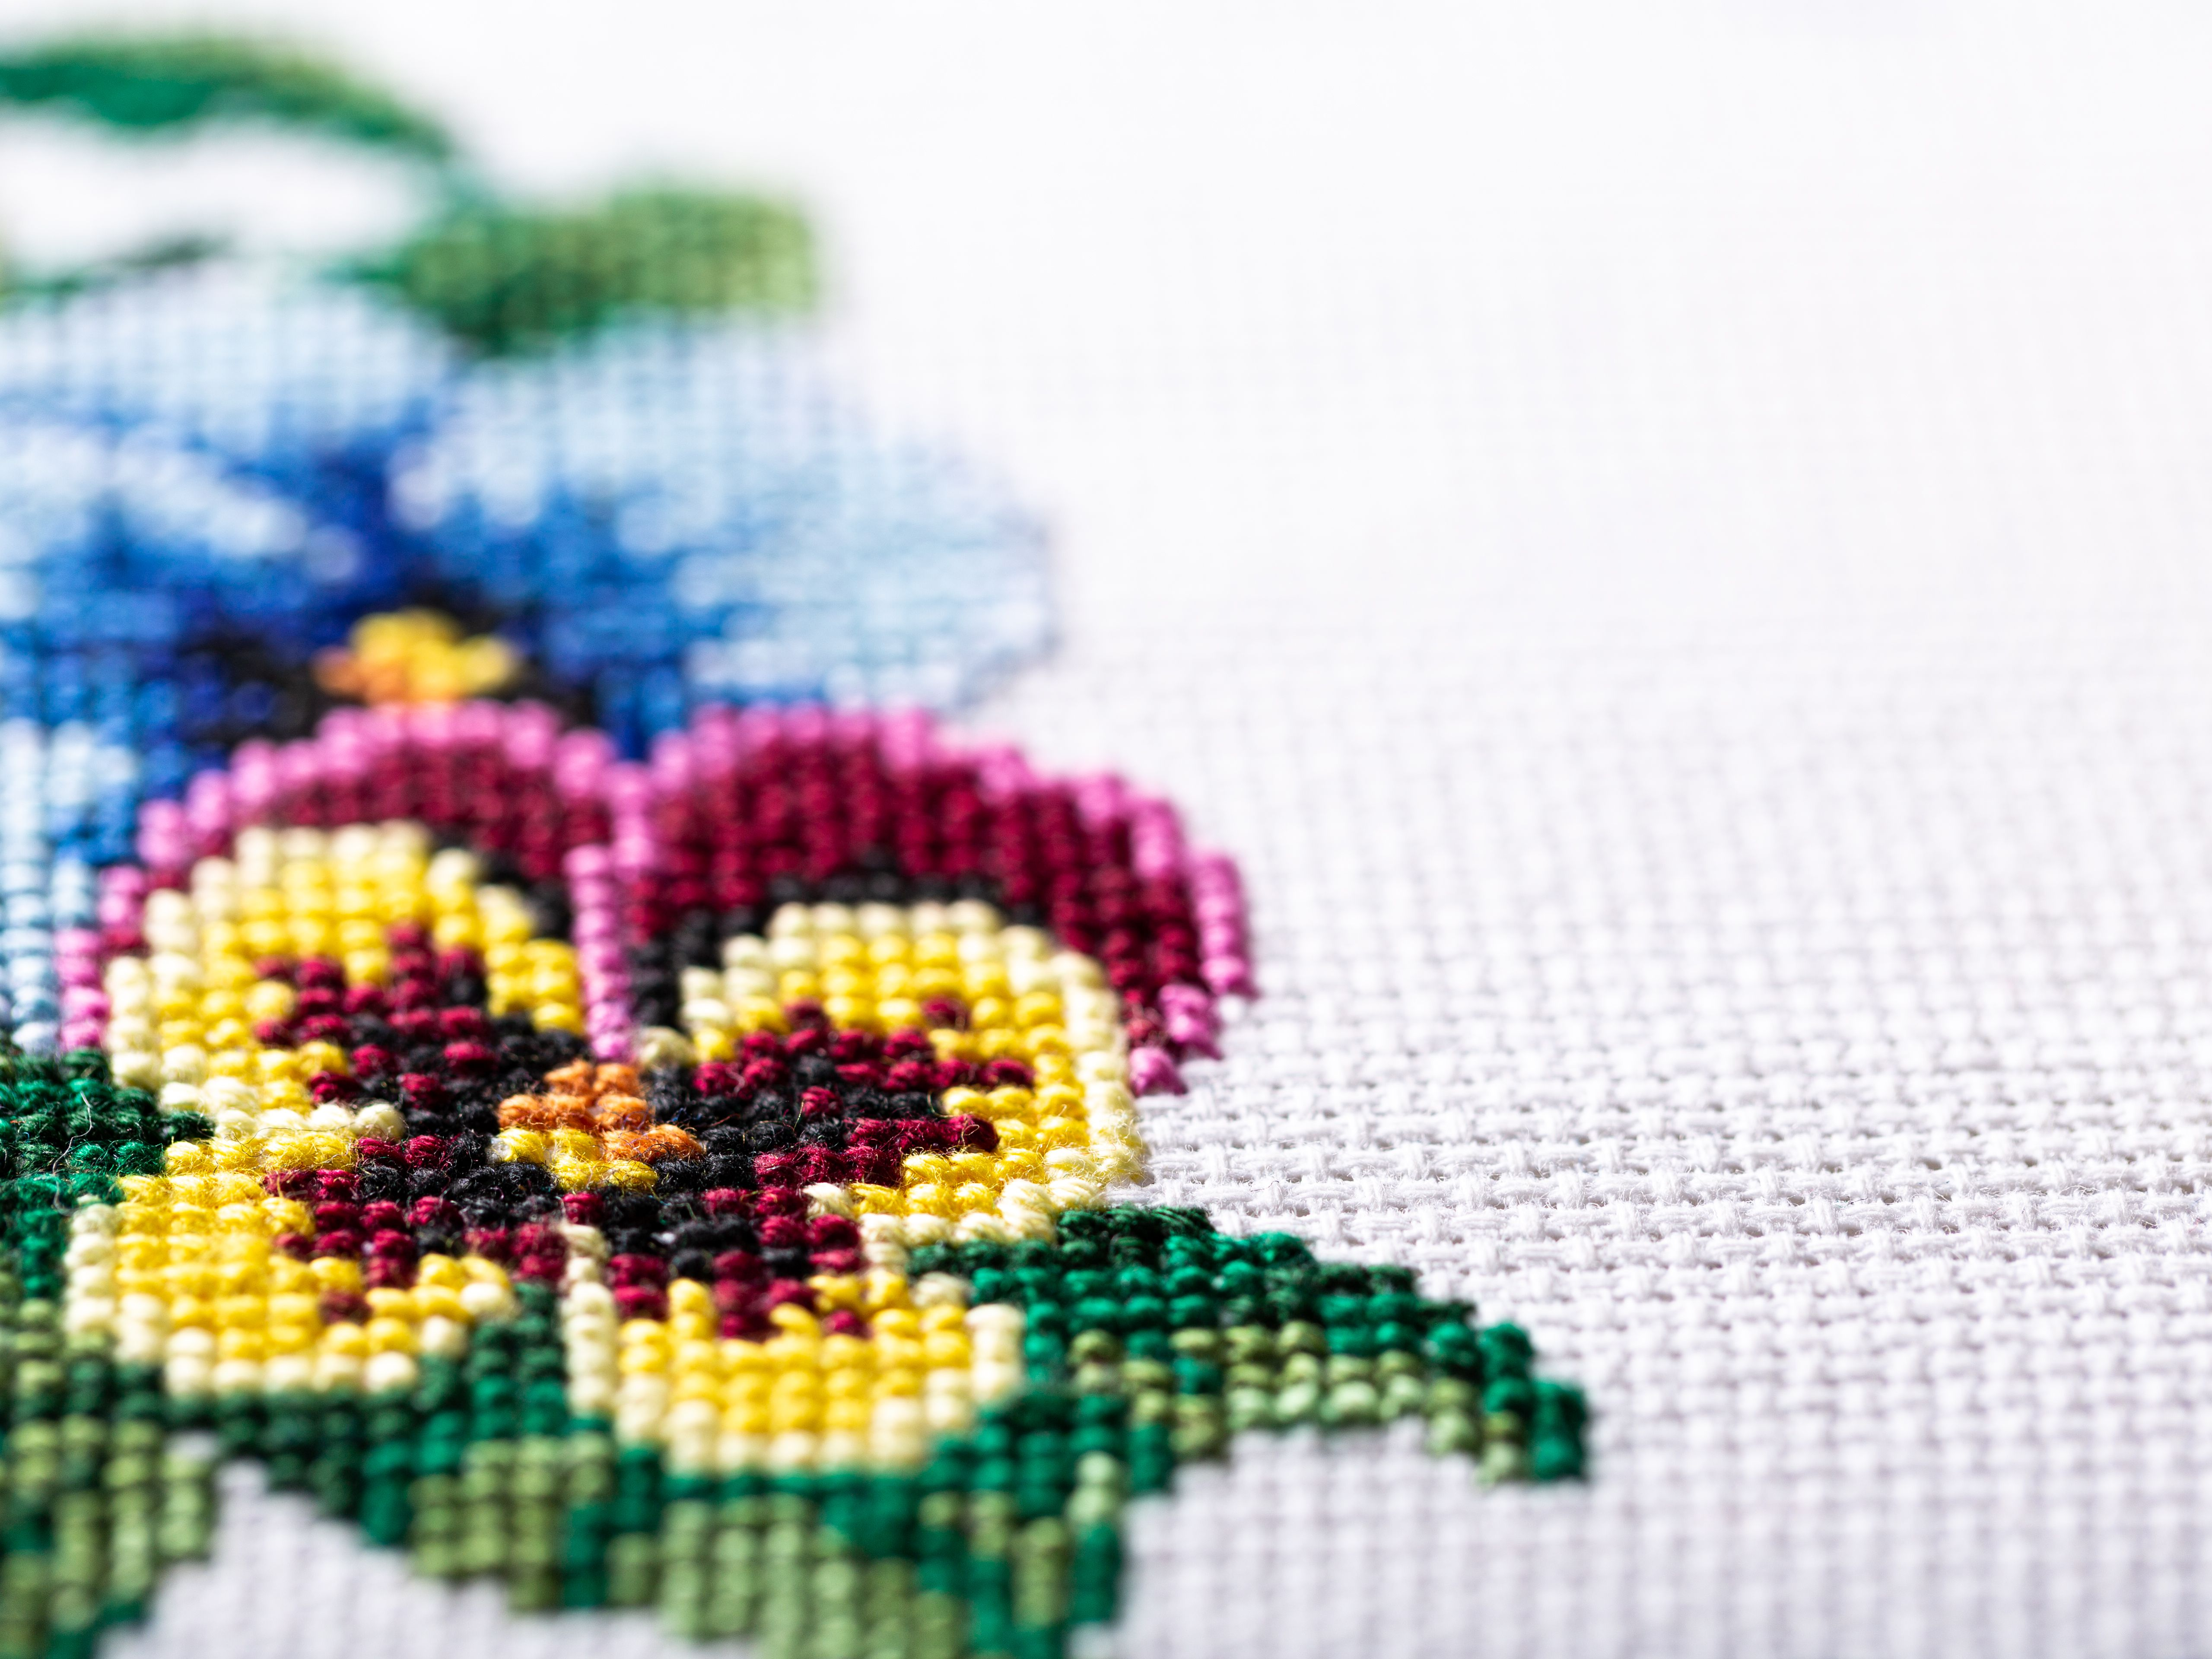 Hydrangeas Cross Stitch Pattern Colorful Art DIY X-stitch  Needlepoint Pattern Embroidery Chart Printable Instant Download PDF Design